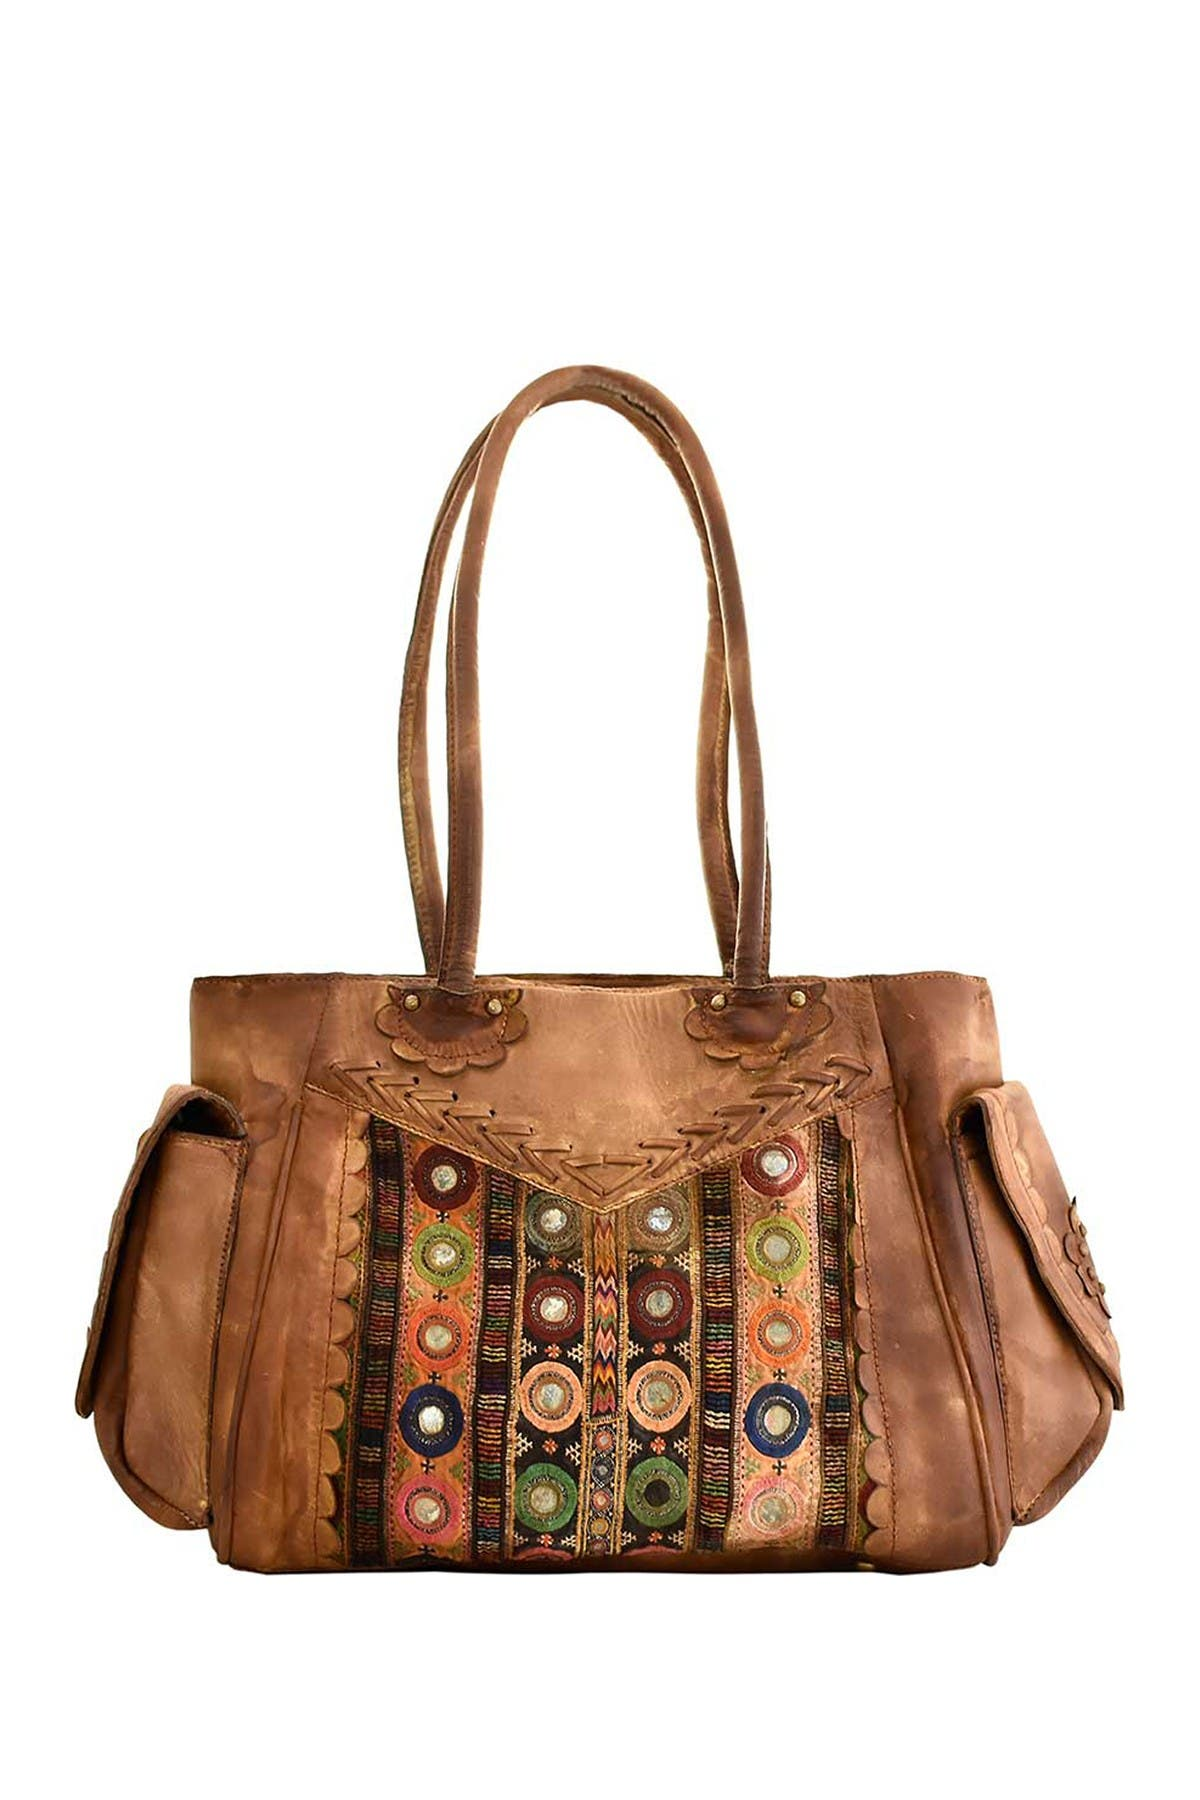 Image of Vintage Addiction Dyed Leather & Vintage Fabrics Satchel